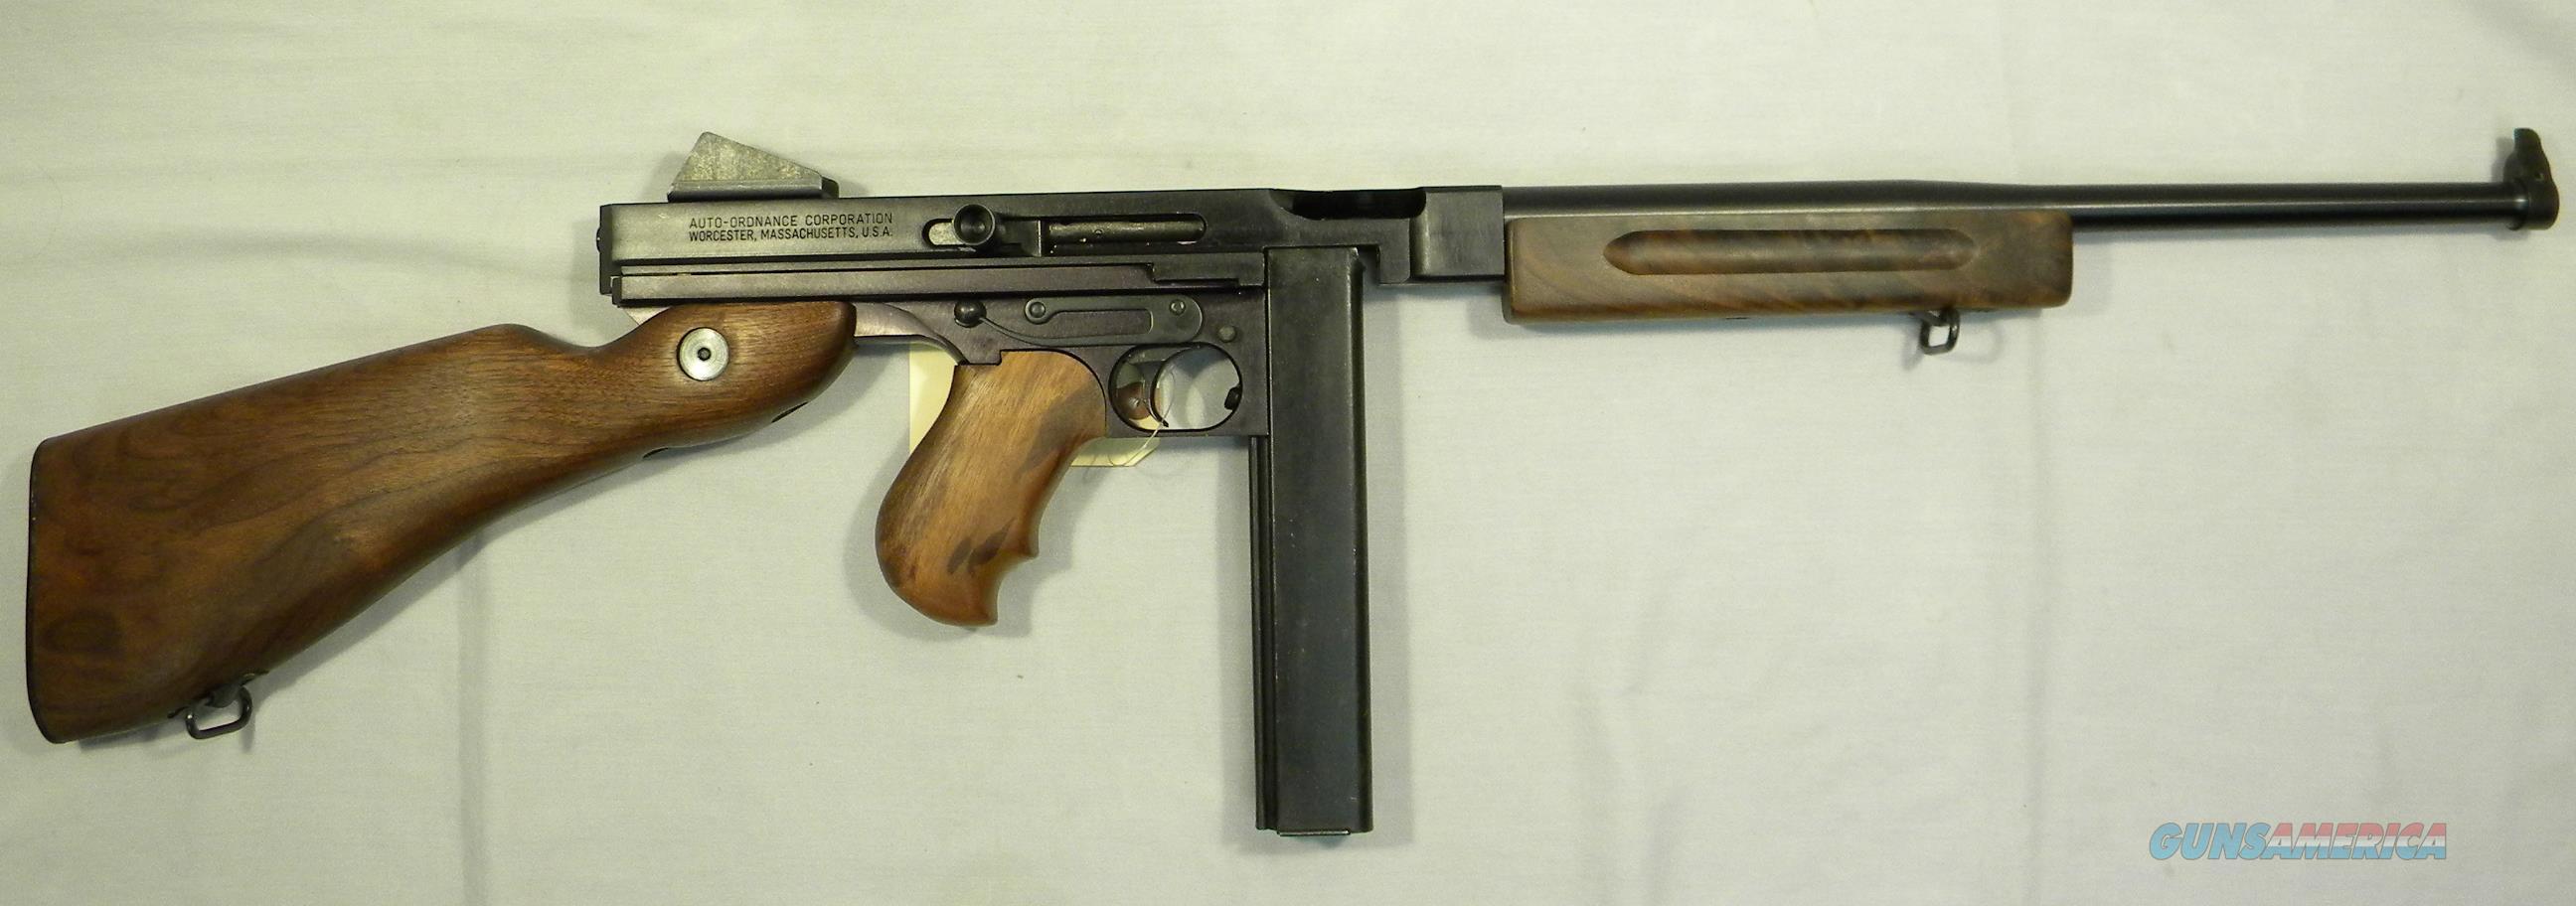 Thompson TM1C Light Weight ''Tommy Gun'',  45 ACP Carbine, Military Model